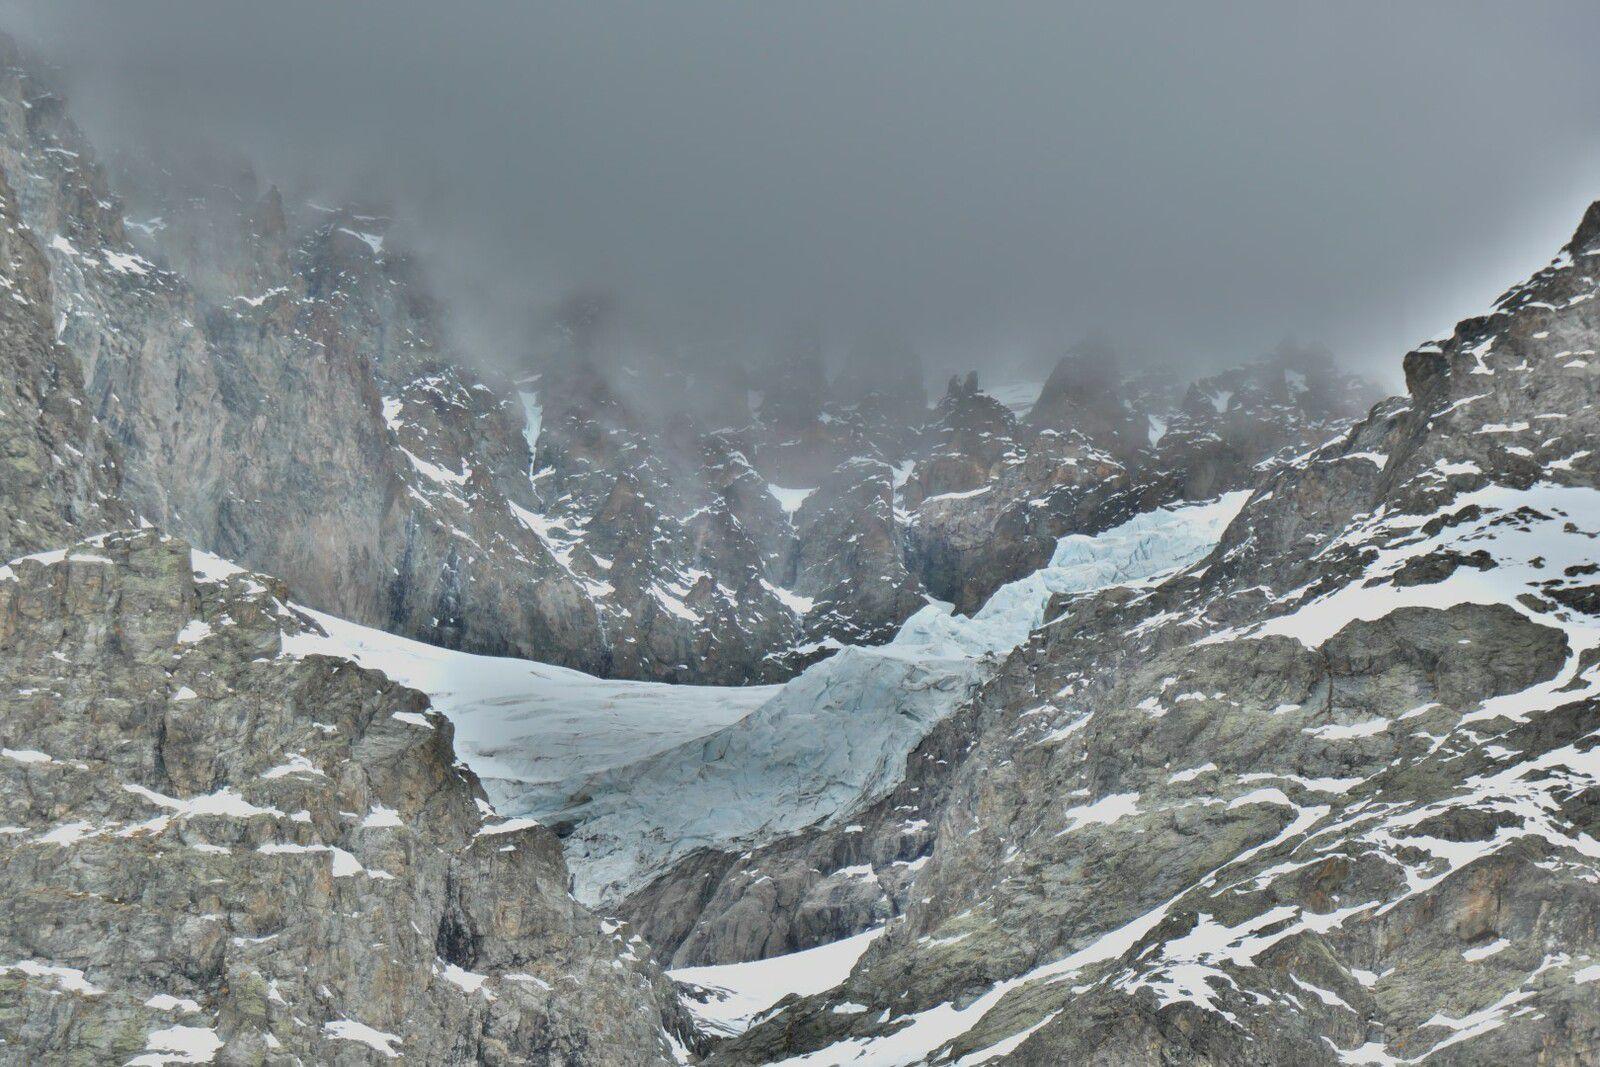 le glacier supérieur de la Condamine suspendu au-dessus